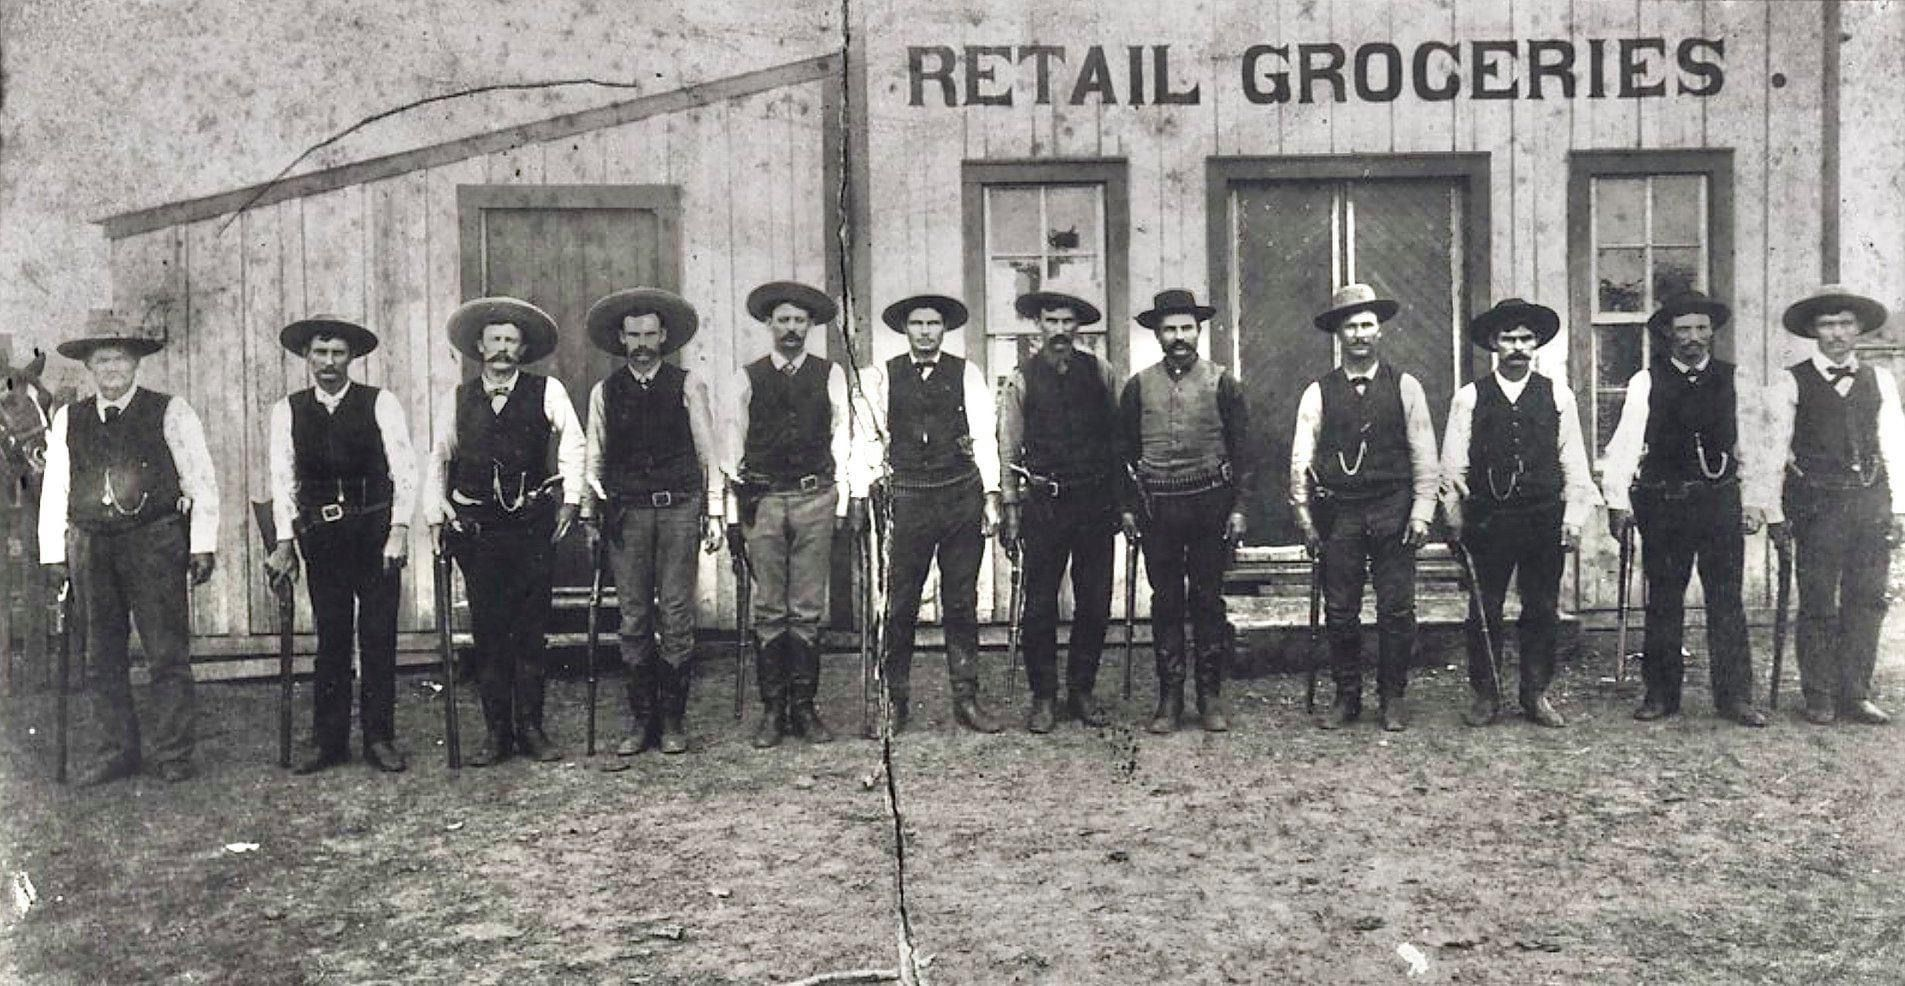 Texas, undated. We presume these are Texas Rangers. Texas